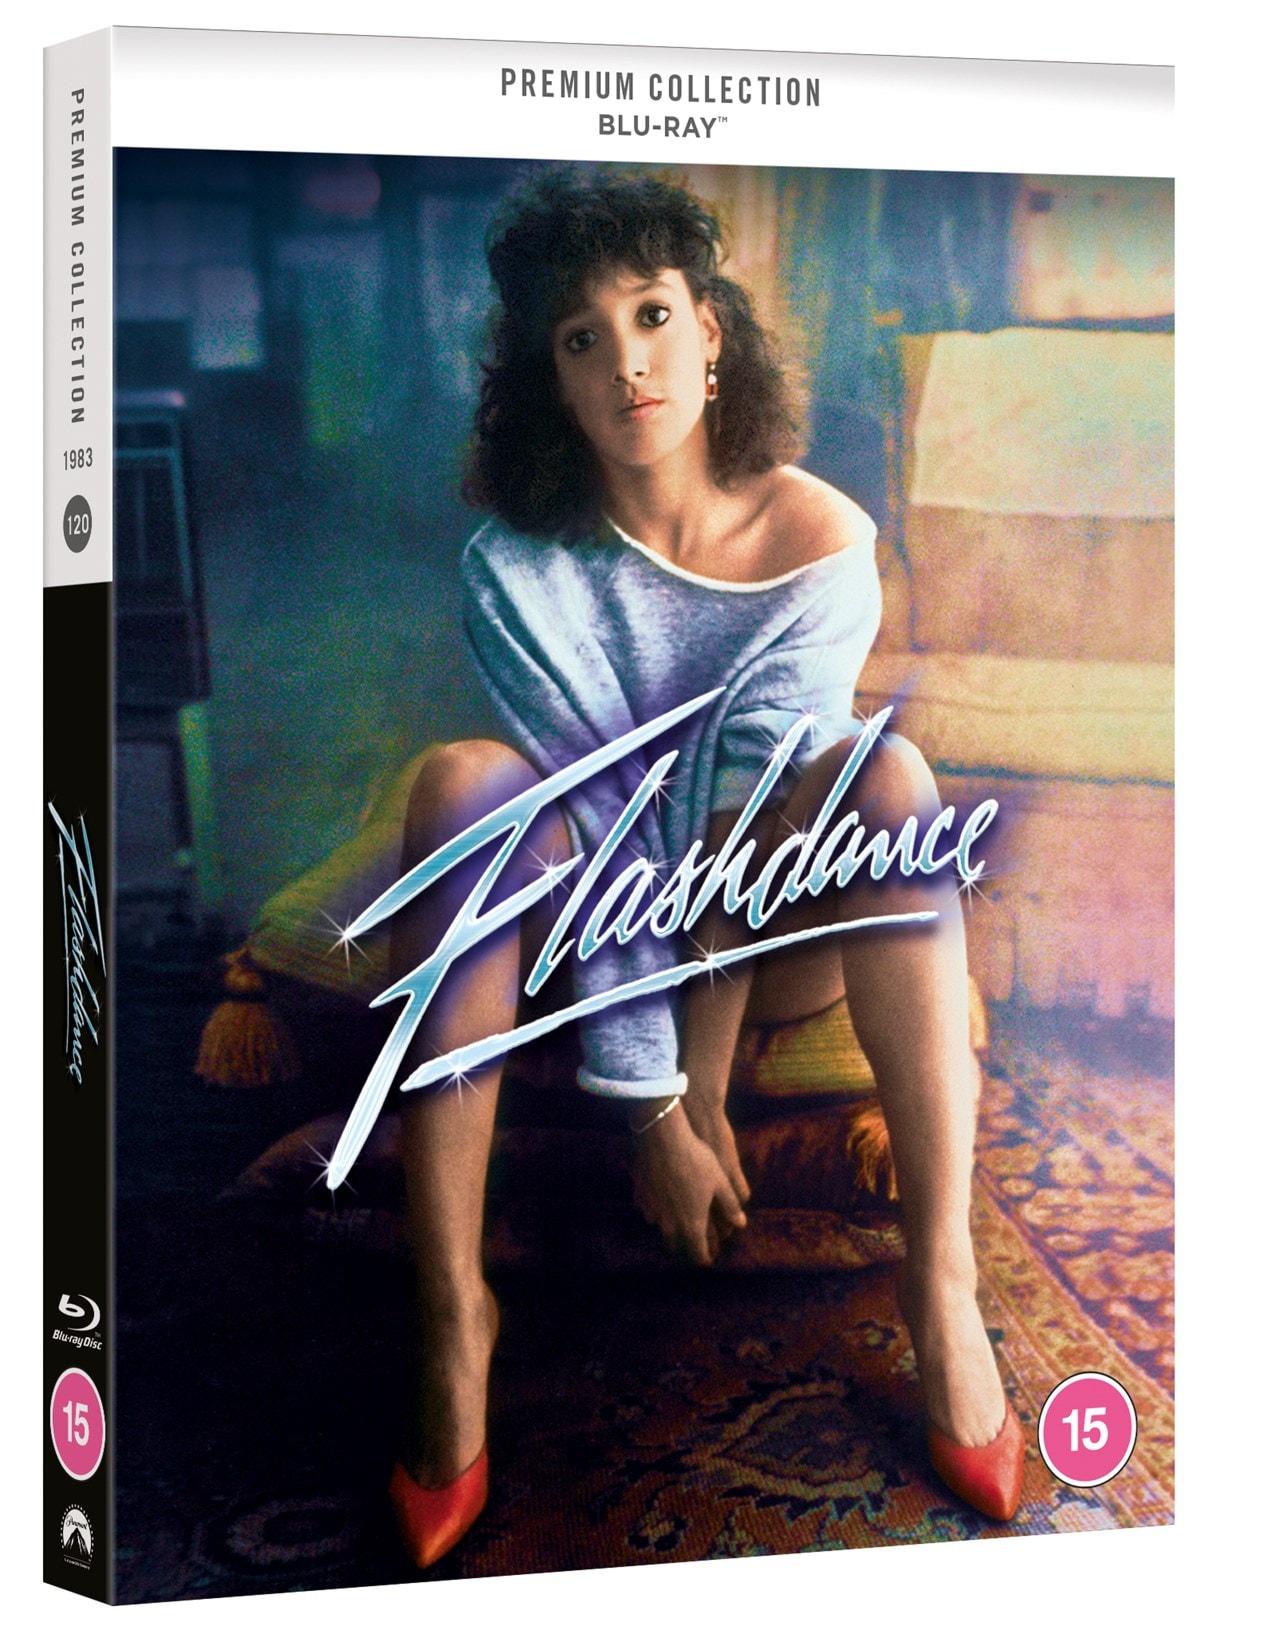 Flashdance (hmv Exclusive) - The Premium Collection - 3